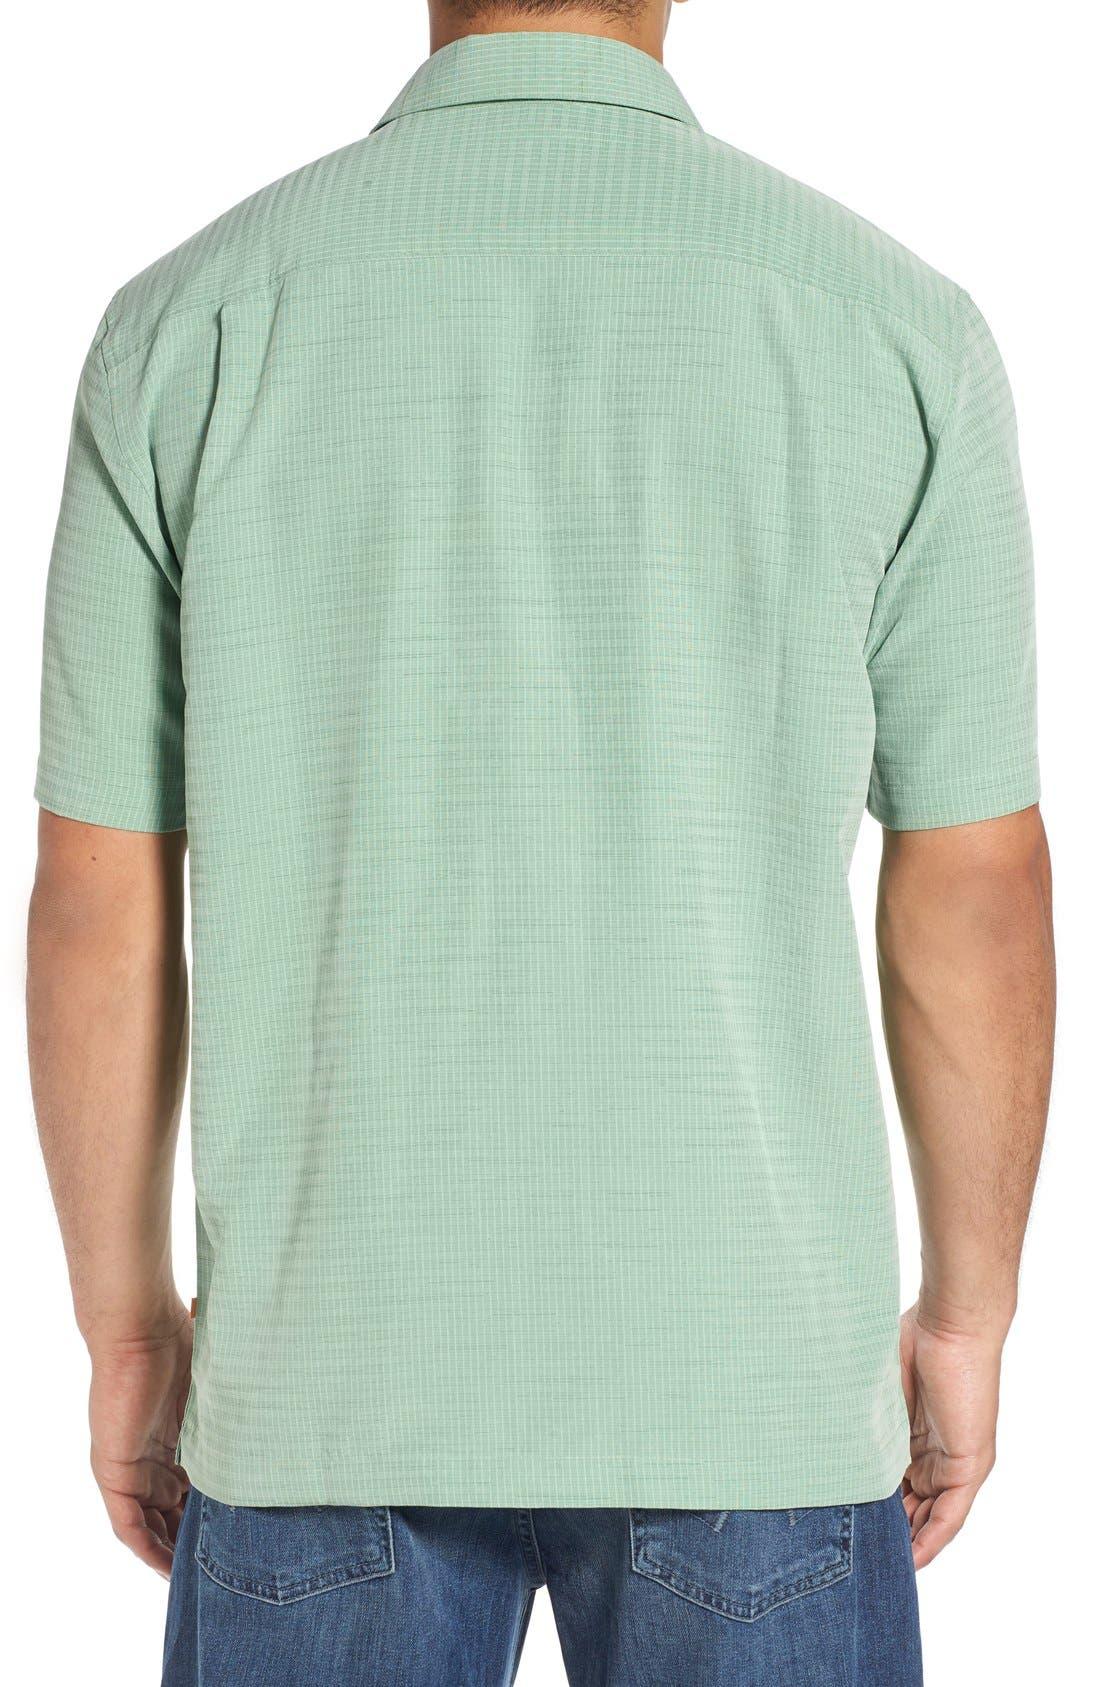 'Centinela 4' Short Sleeve Sport Shirt,                             Alternate thumbnail 74, color,